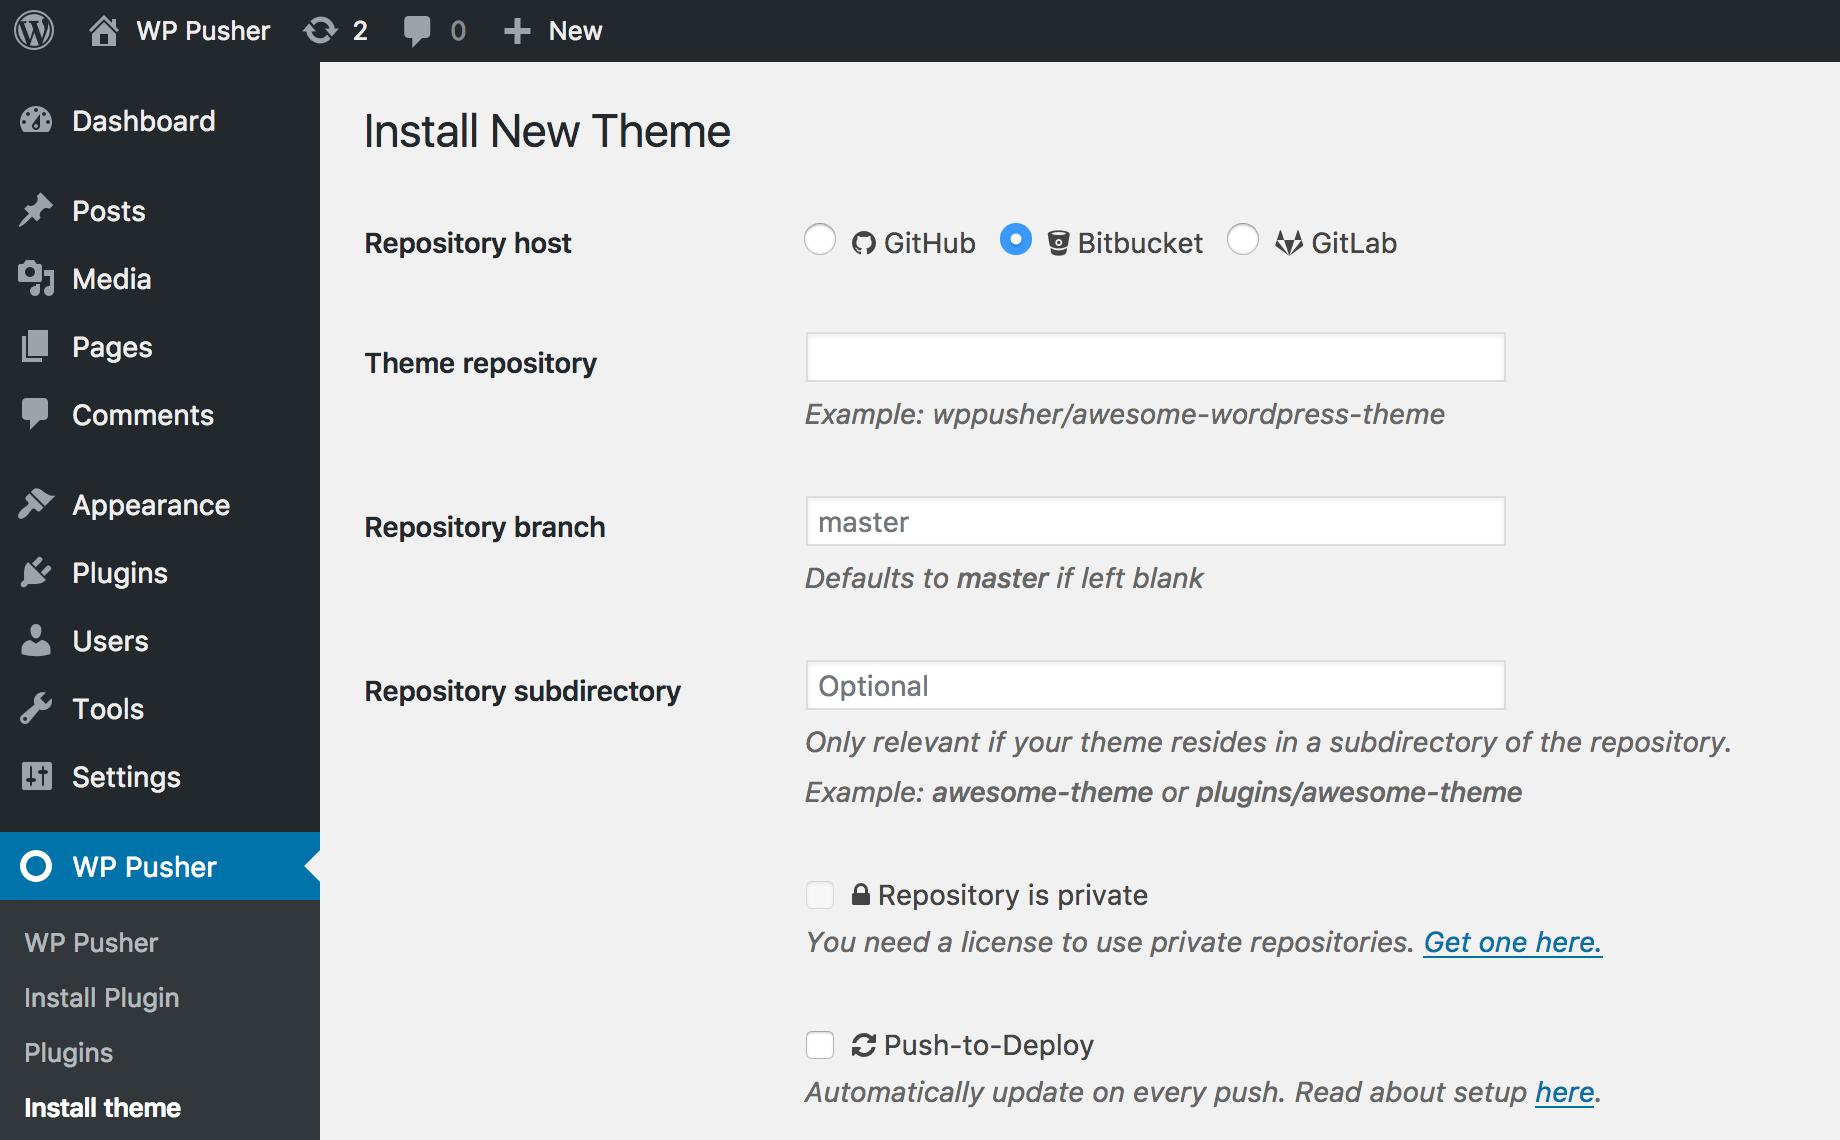 WordPress Git deployments with WP Pusher